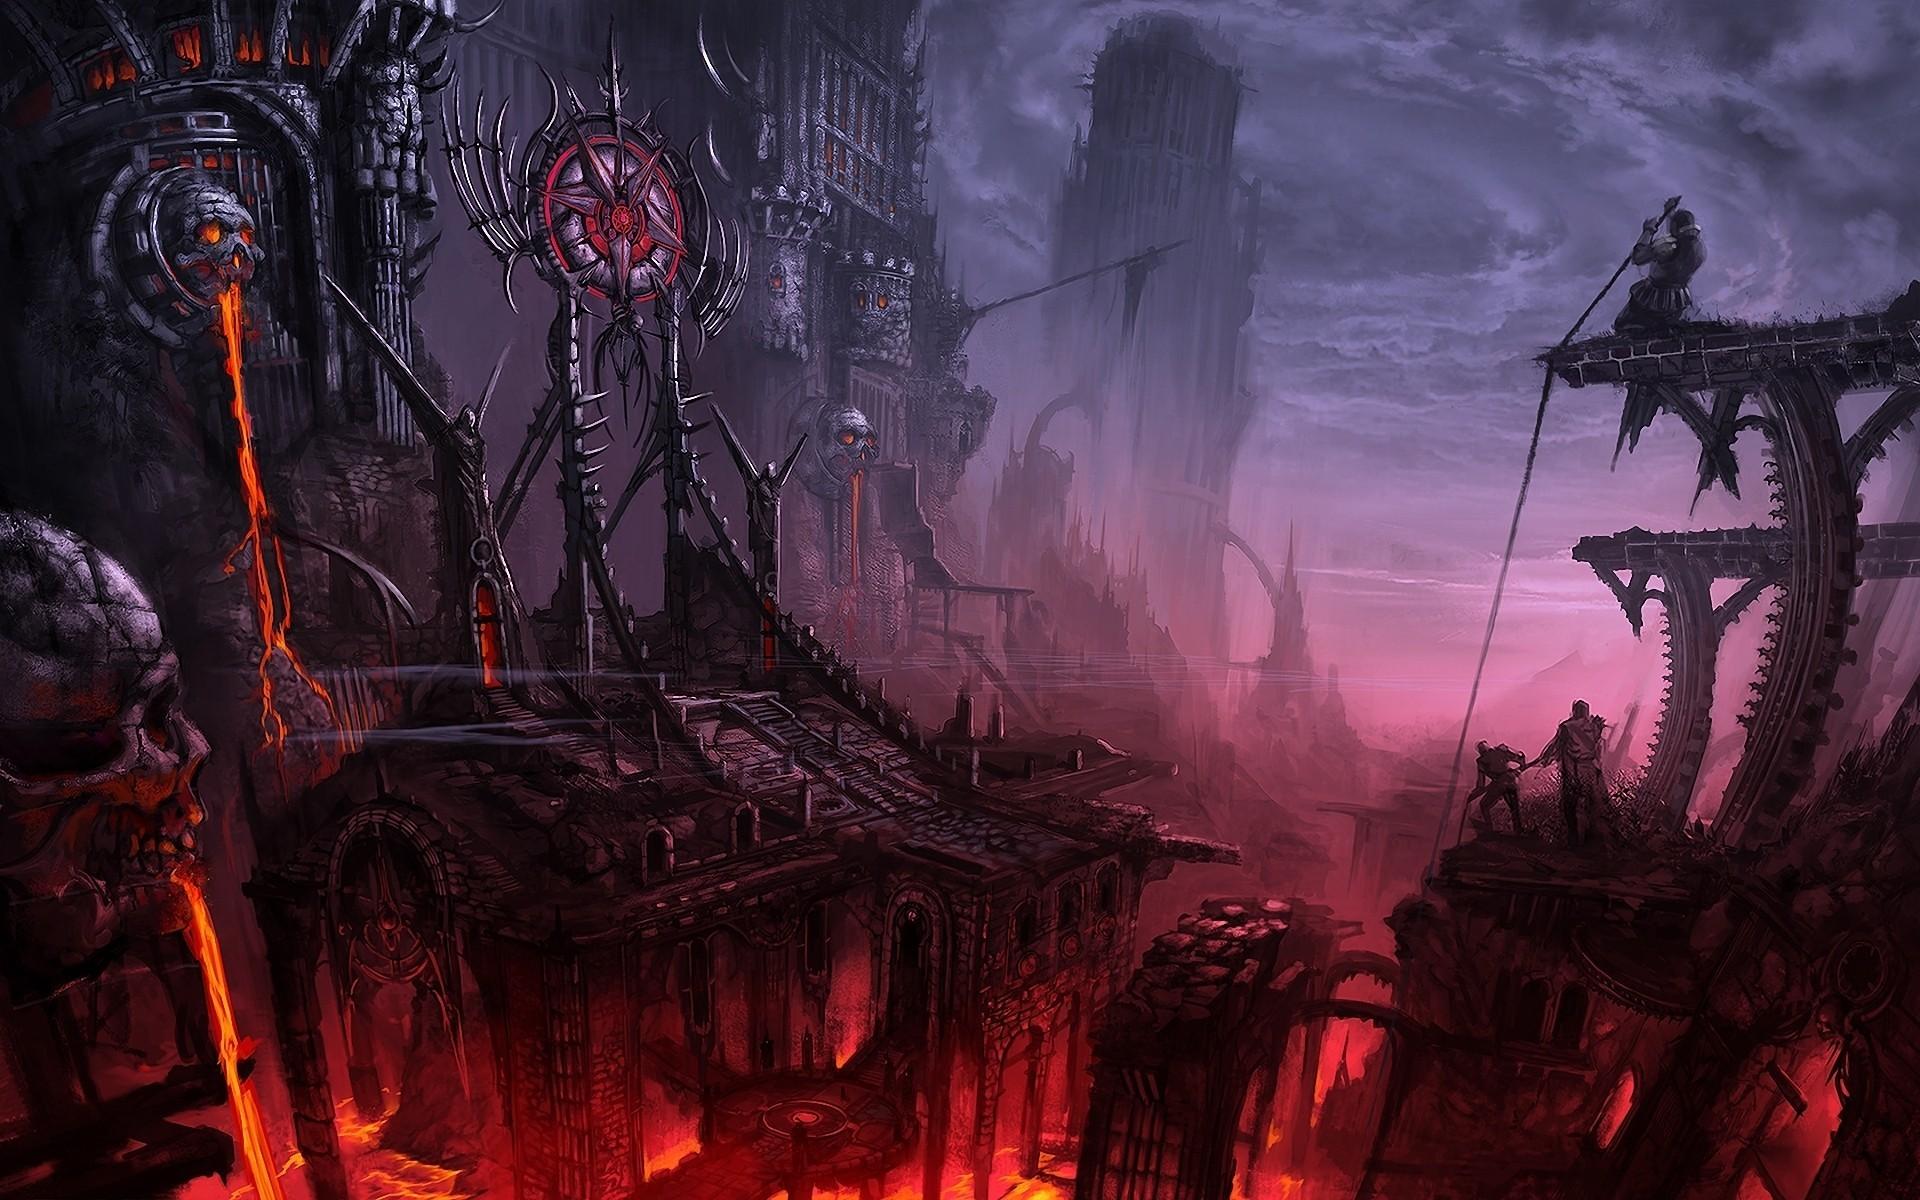 Dark Fantasy World wallpapers and stock photos